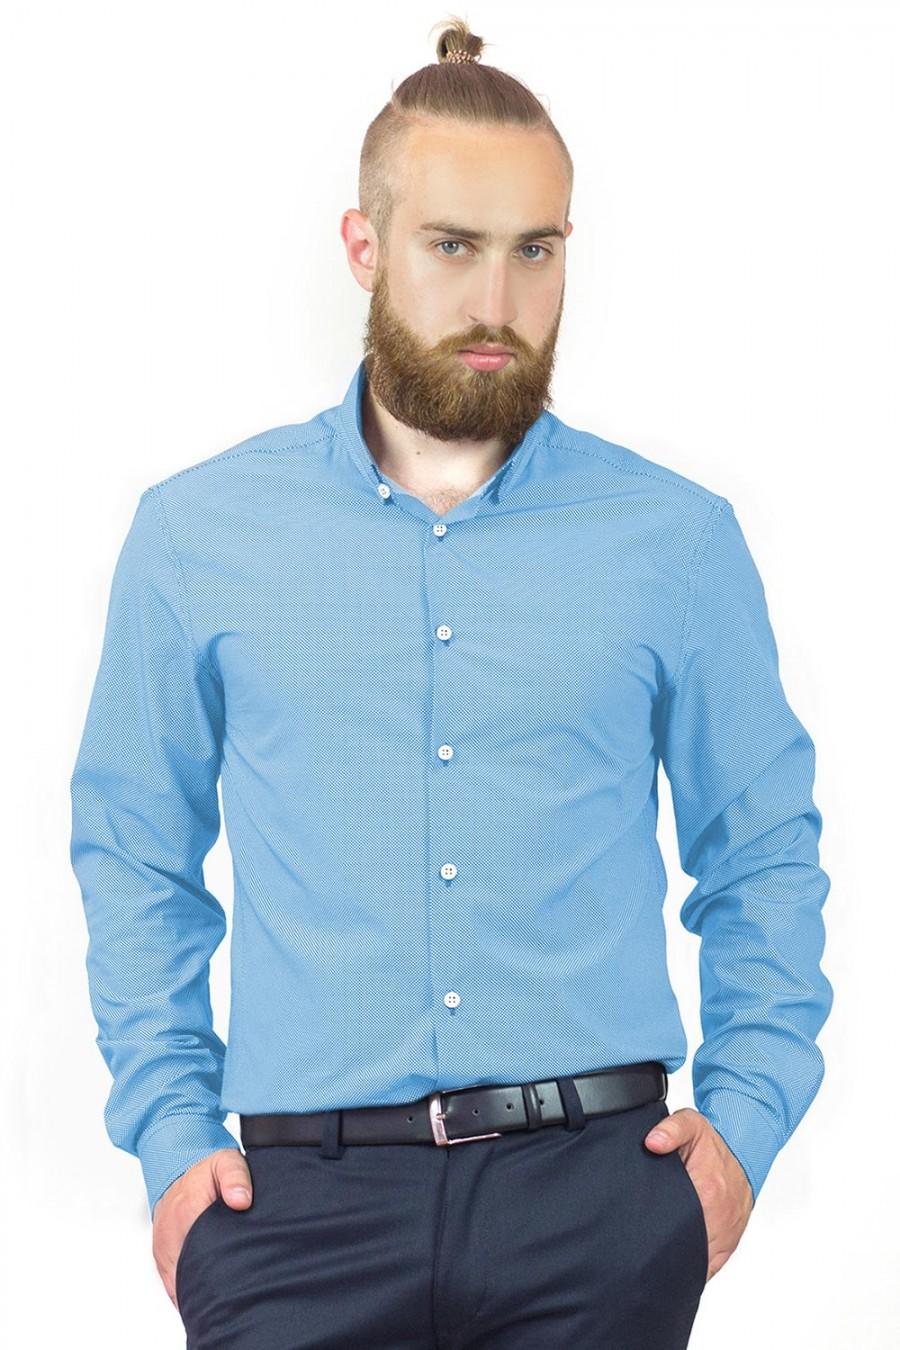 Мужская рубашка S-121-3